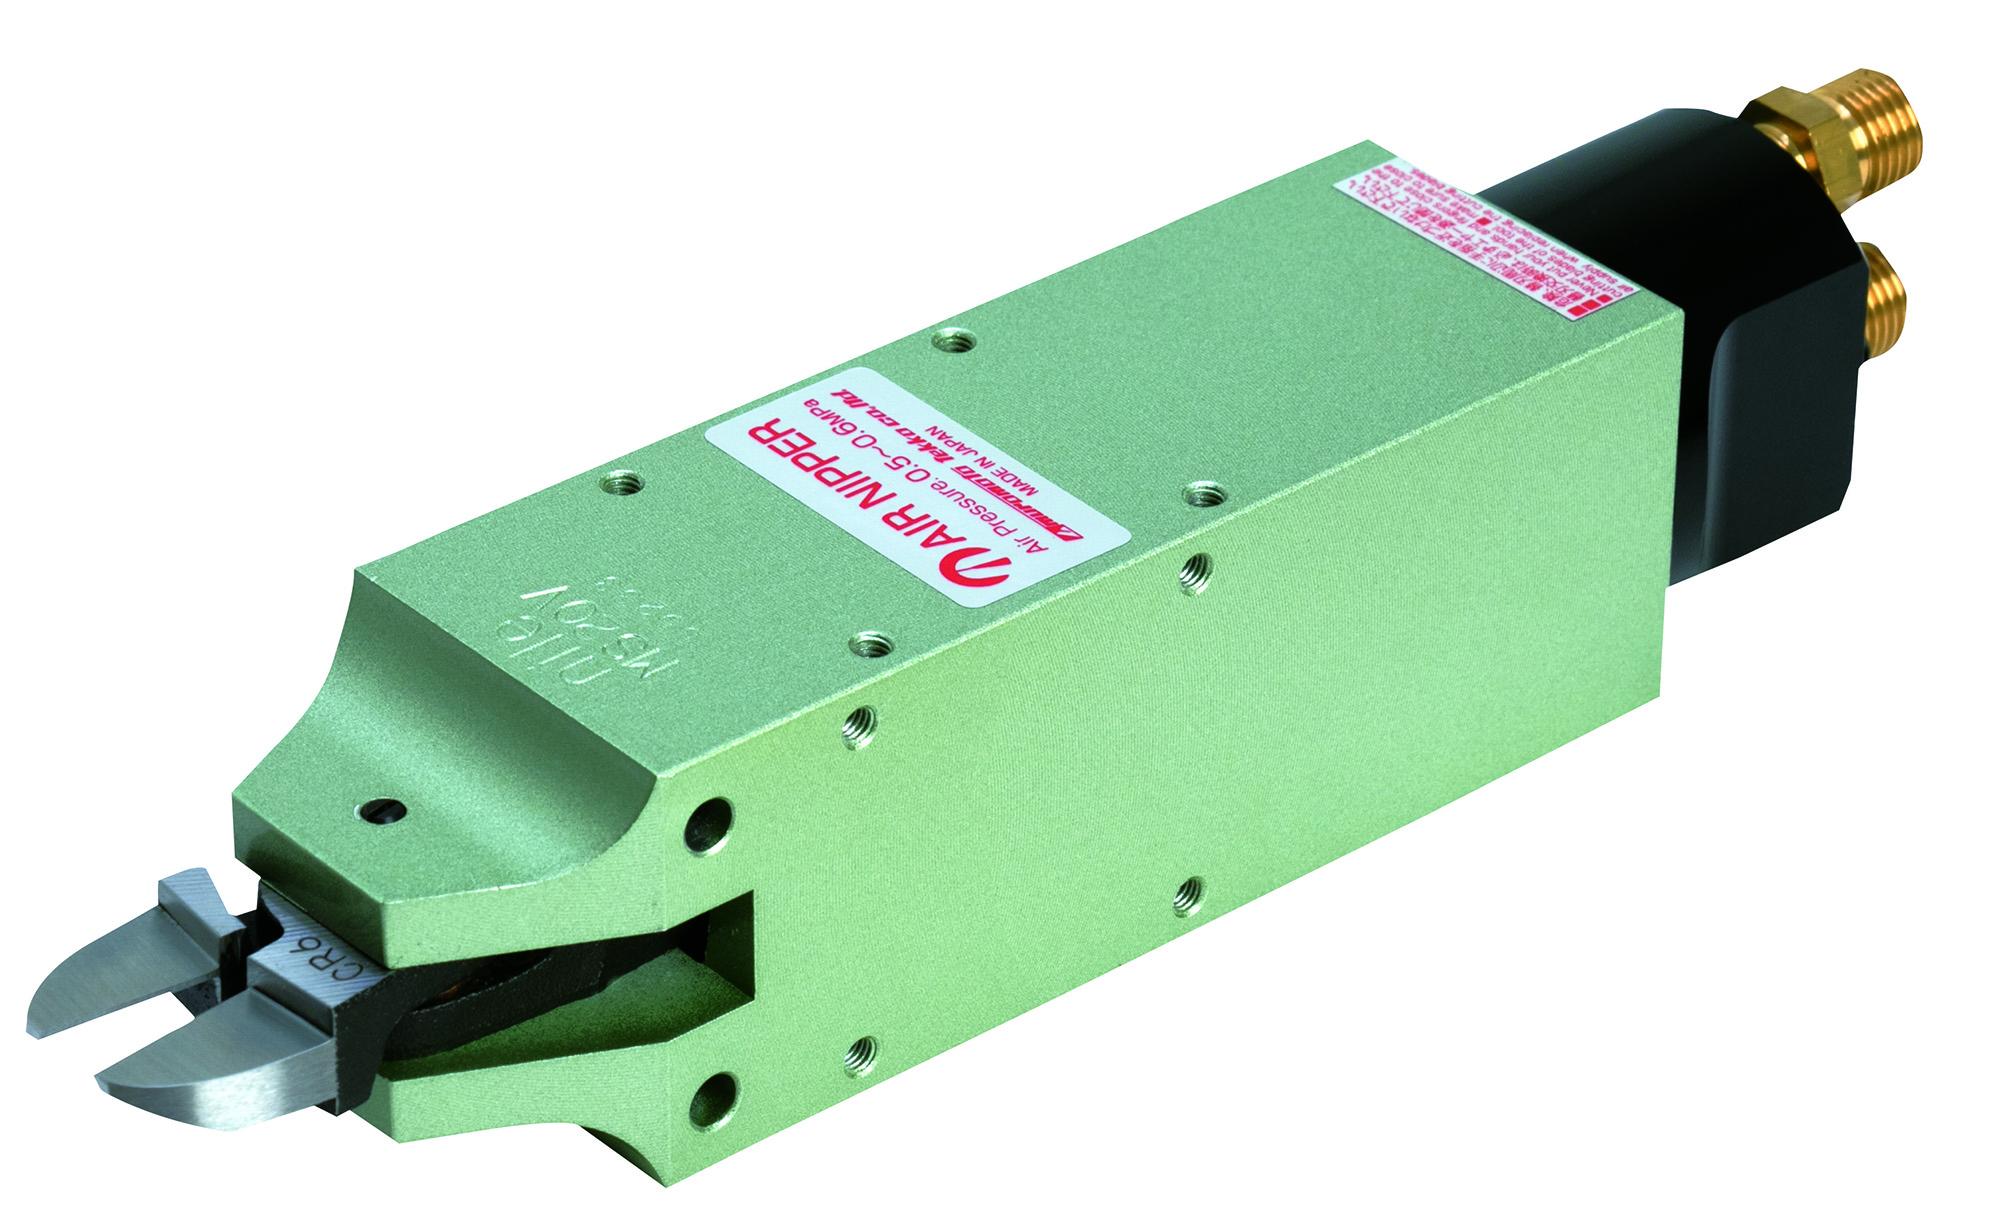 MS-V型 機械取付式角型エアーニッパ 復動式